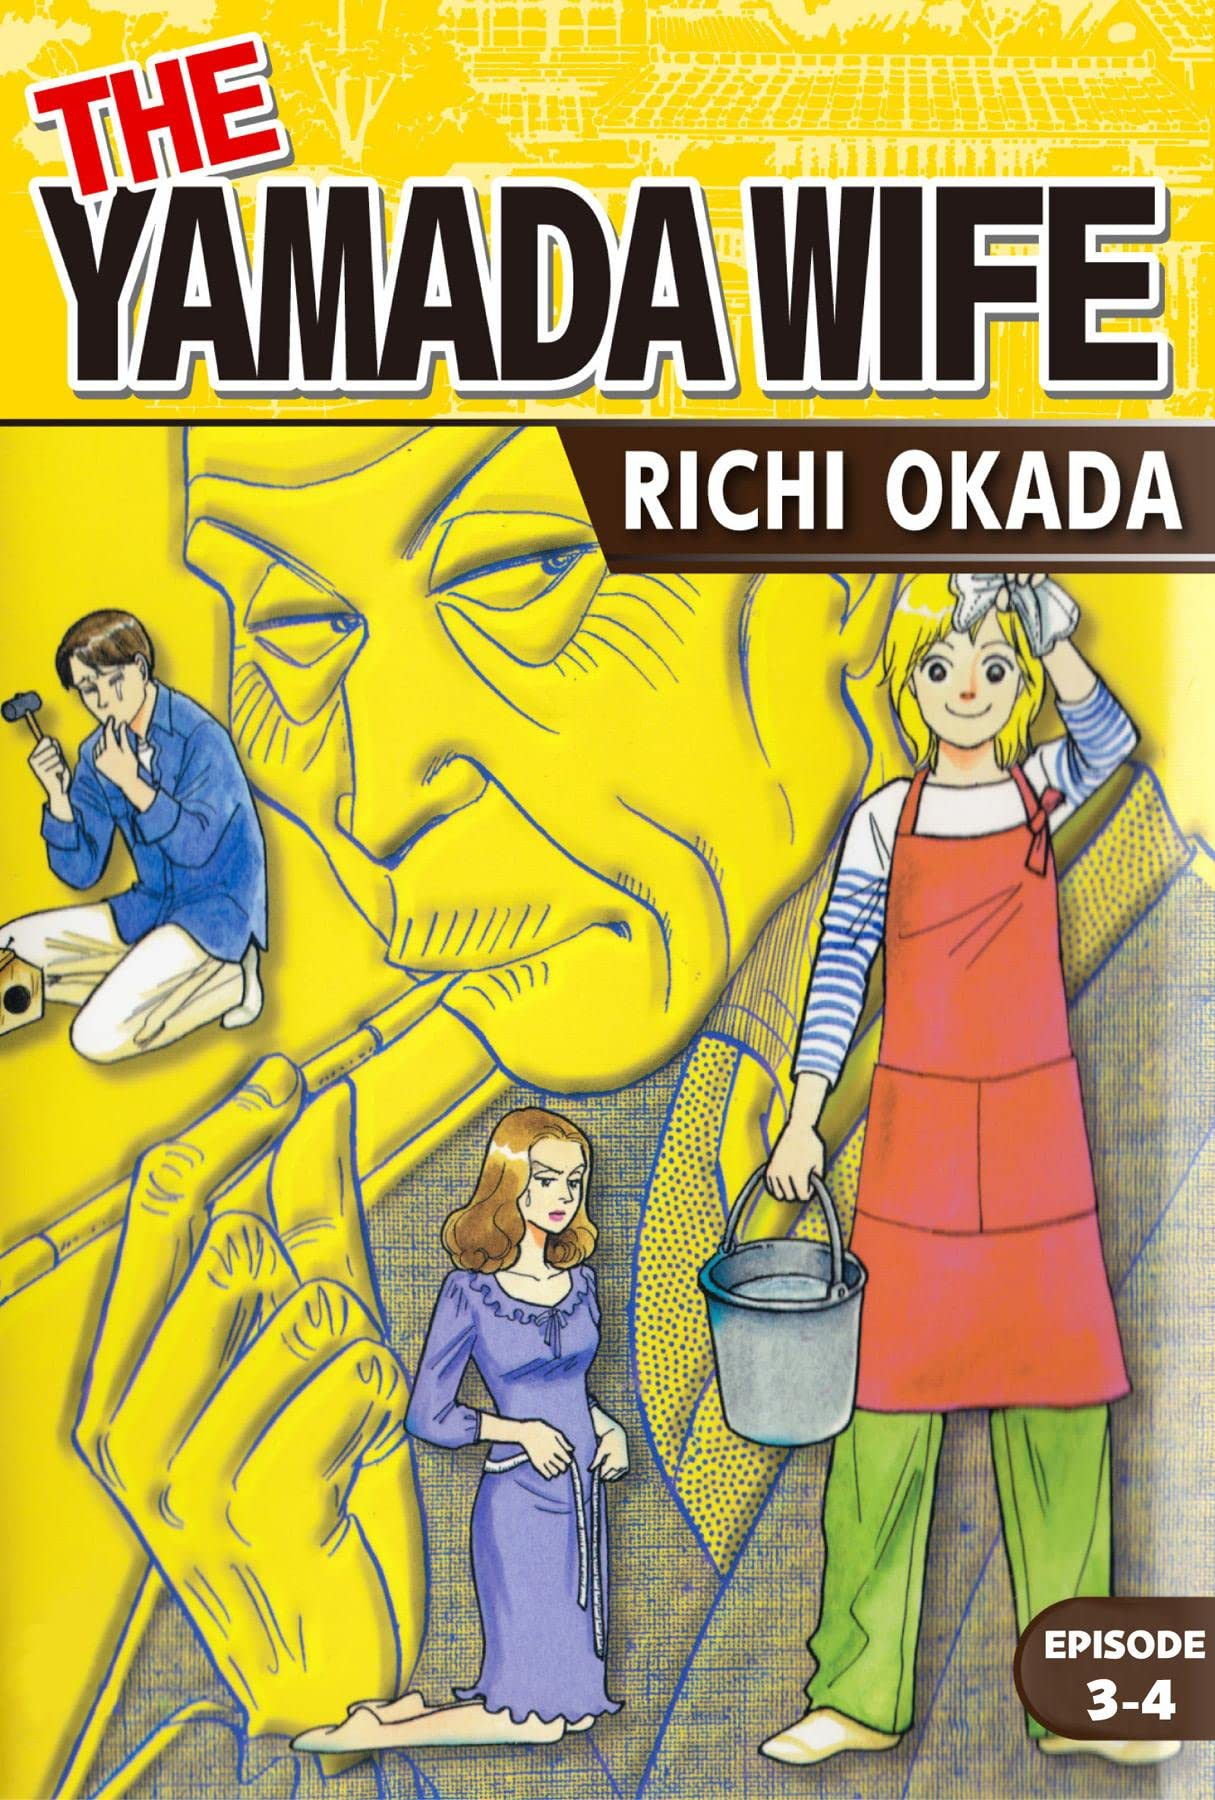 THE YAMADA WIFE #18